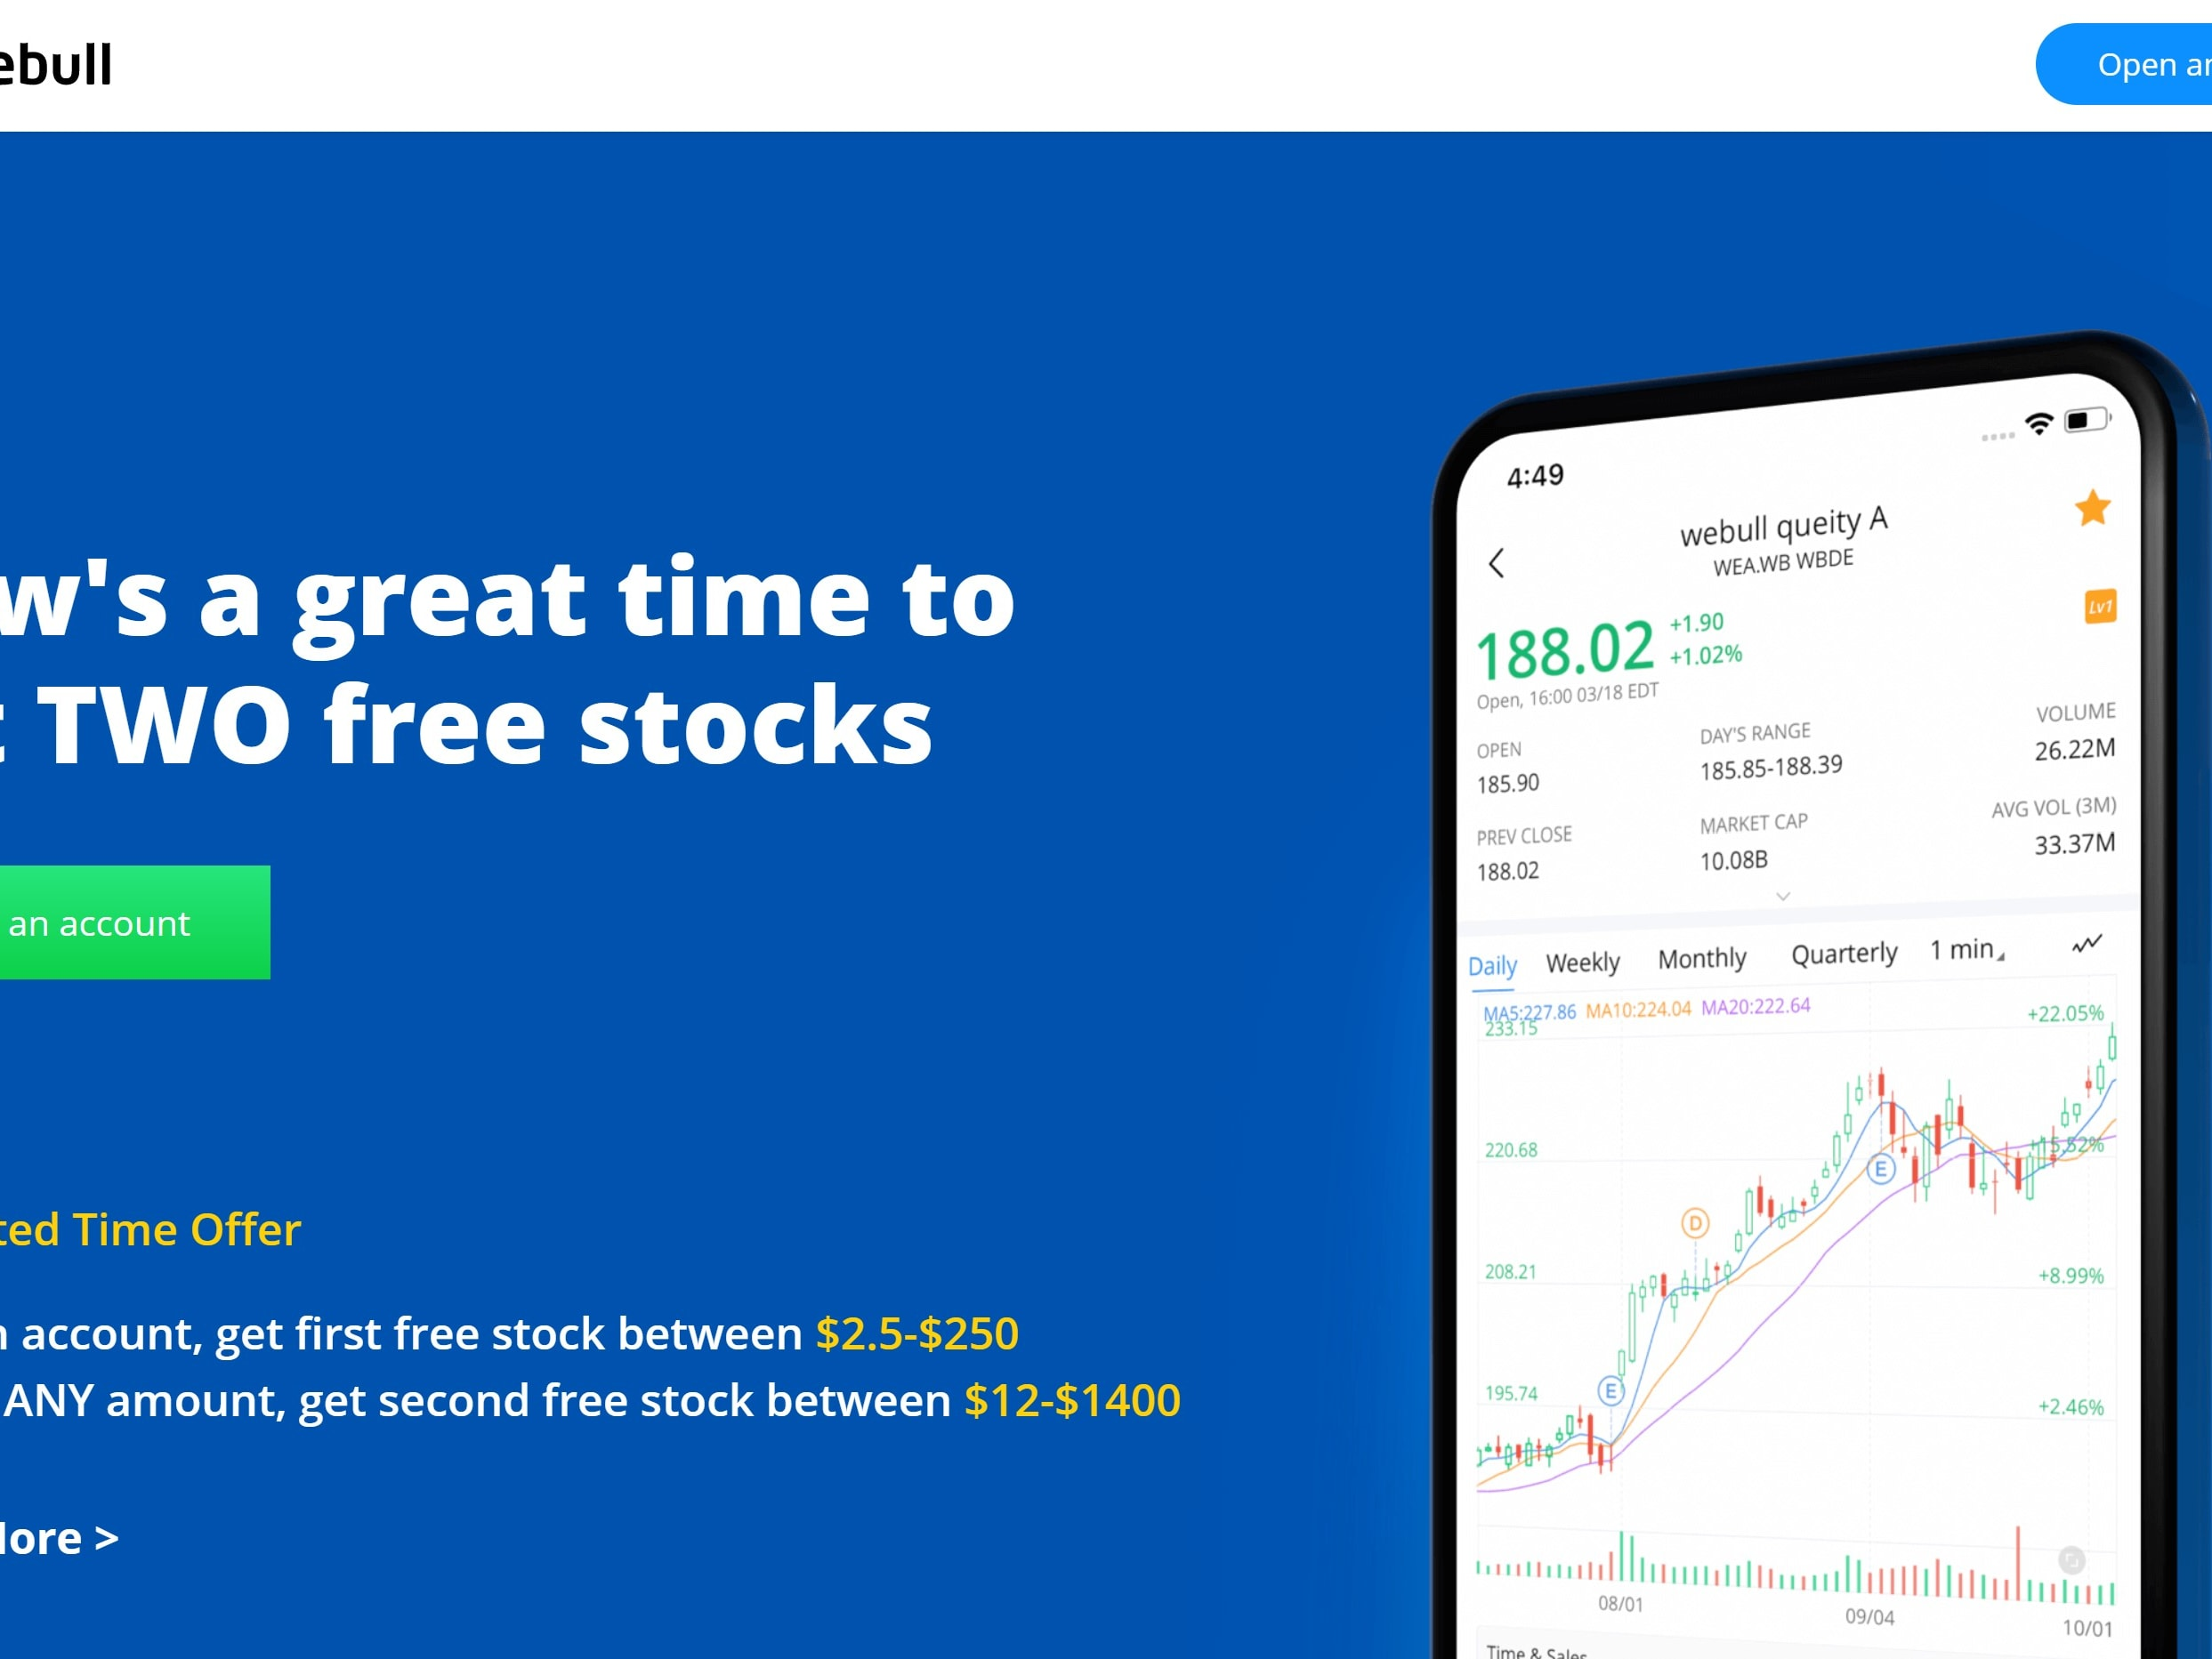 Earn 4 free shares on webull